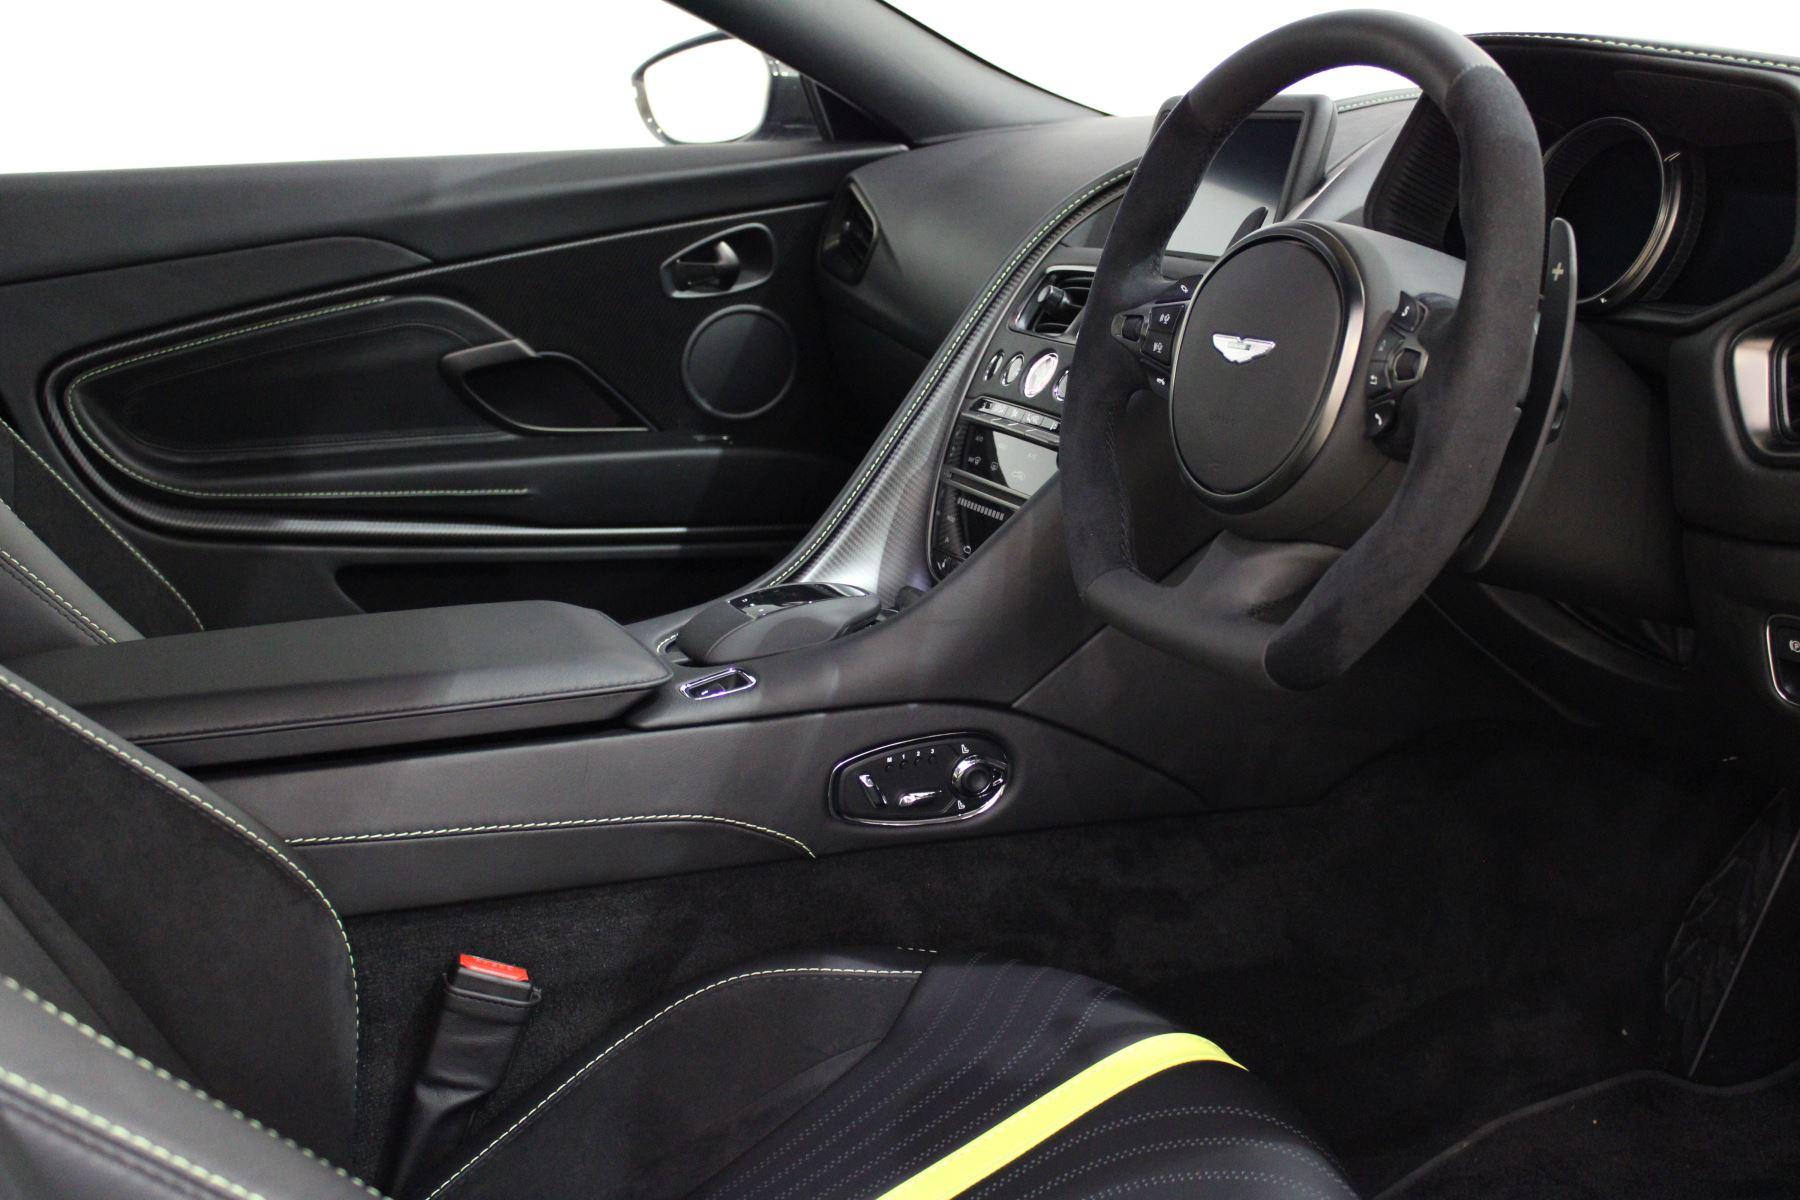 Aston Martin DB11 AMR Touchtronic image 3